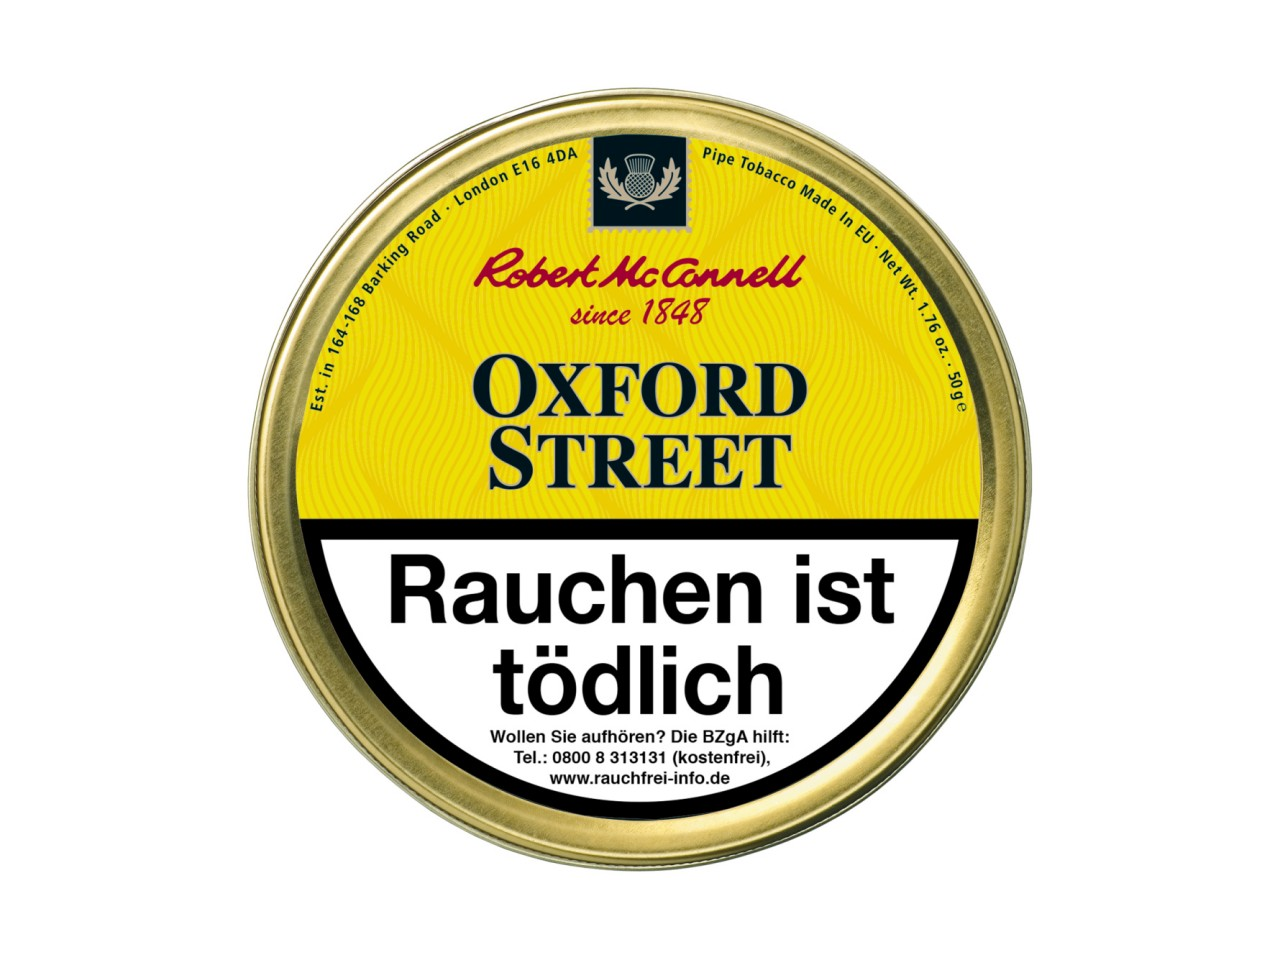 Robert McConnell Oxford Street